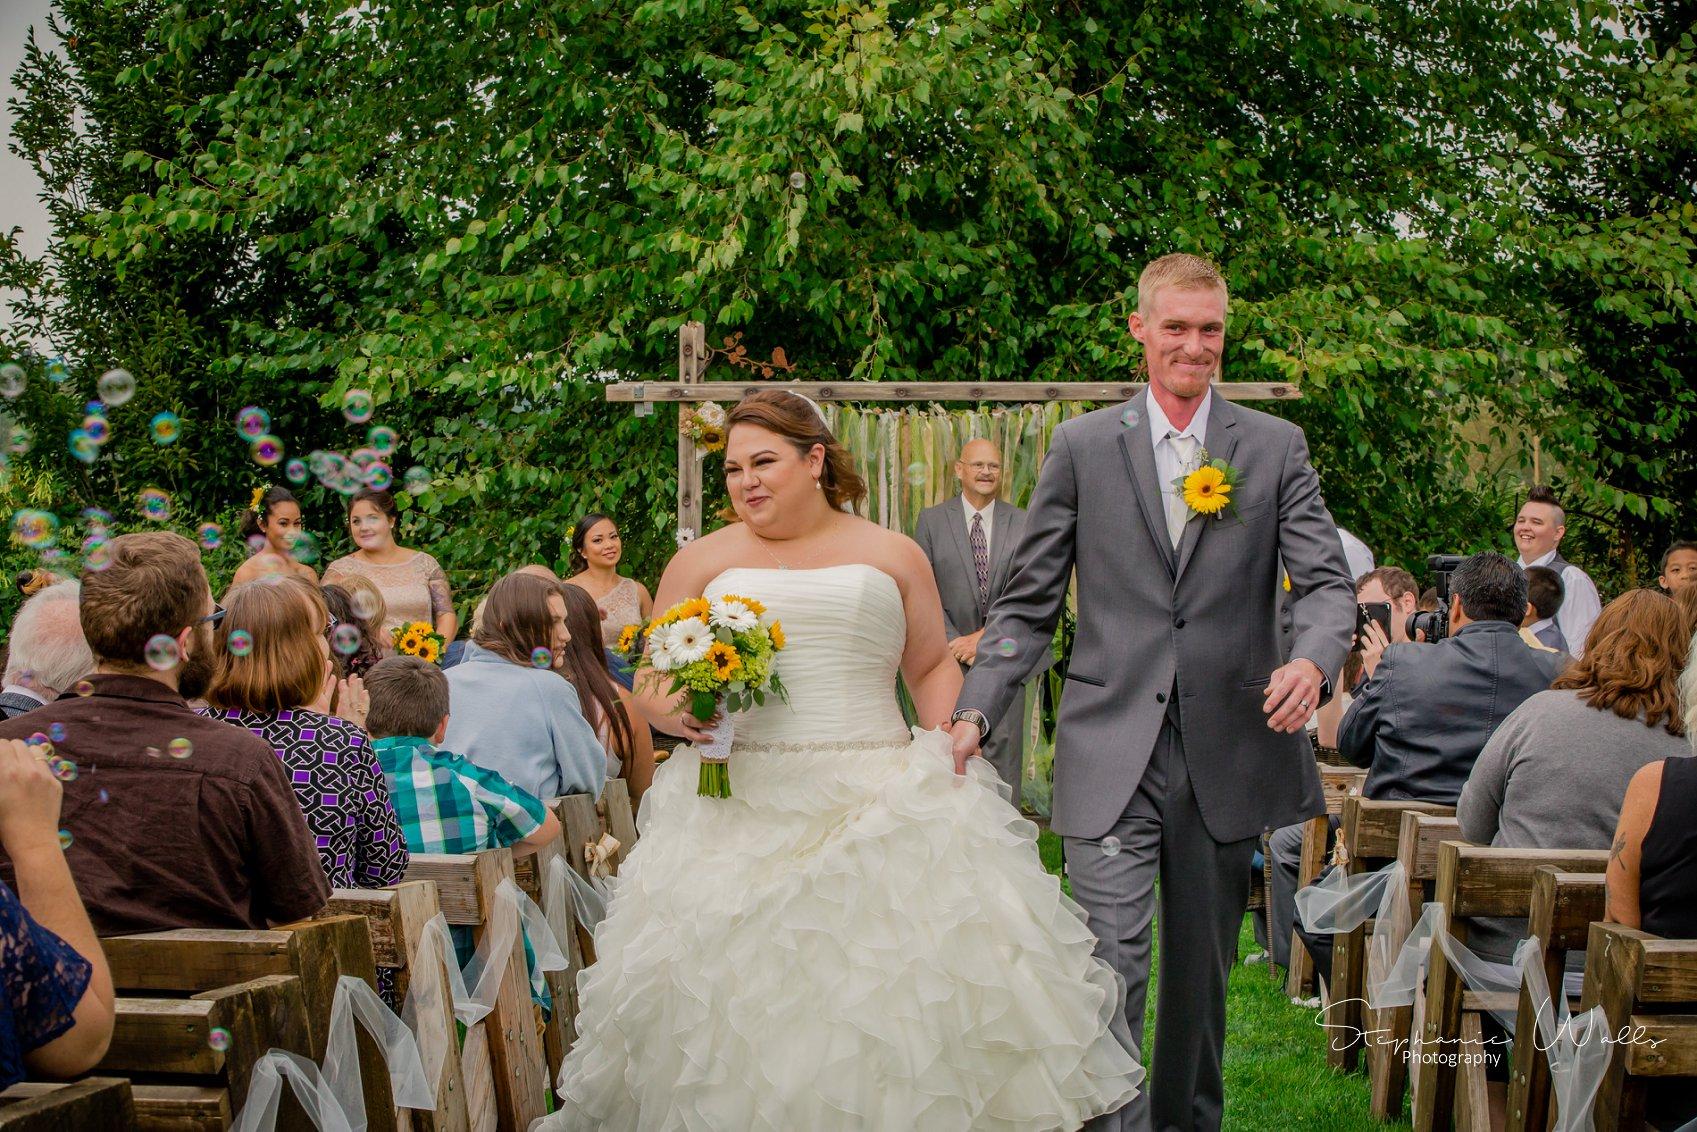 Kimble Wedding 237 Marlena & Allans | Snohomish Red Barn Events (Stocker Farms) | Snohomish, Wa Wedding Photographer